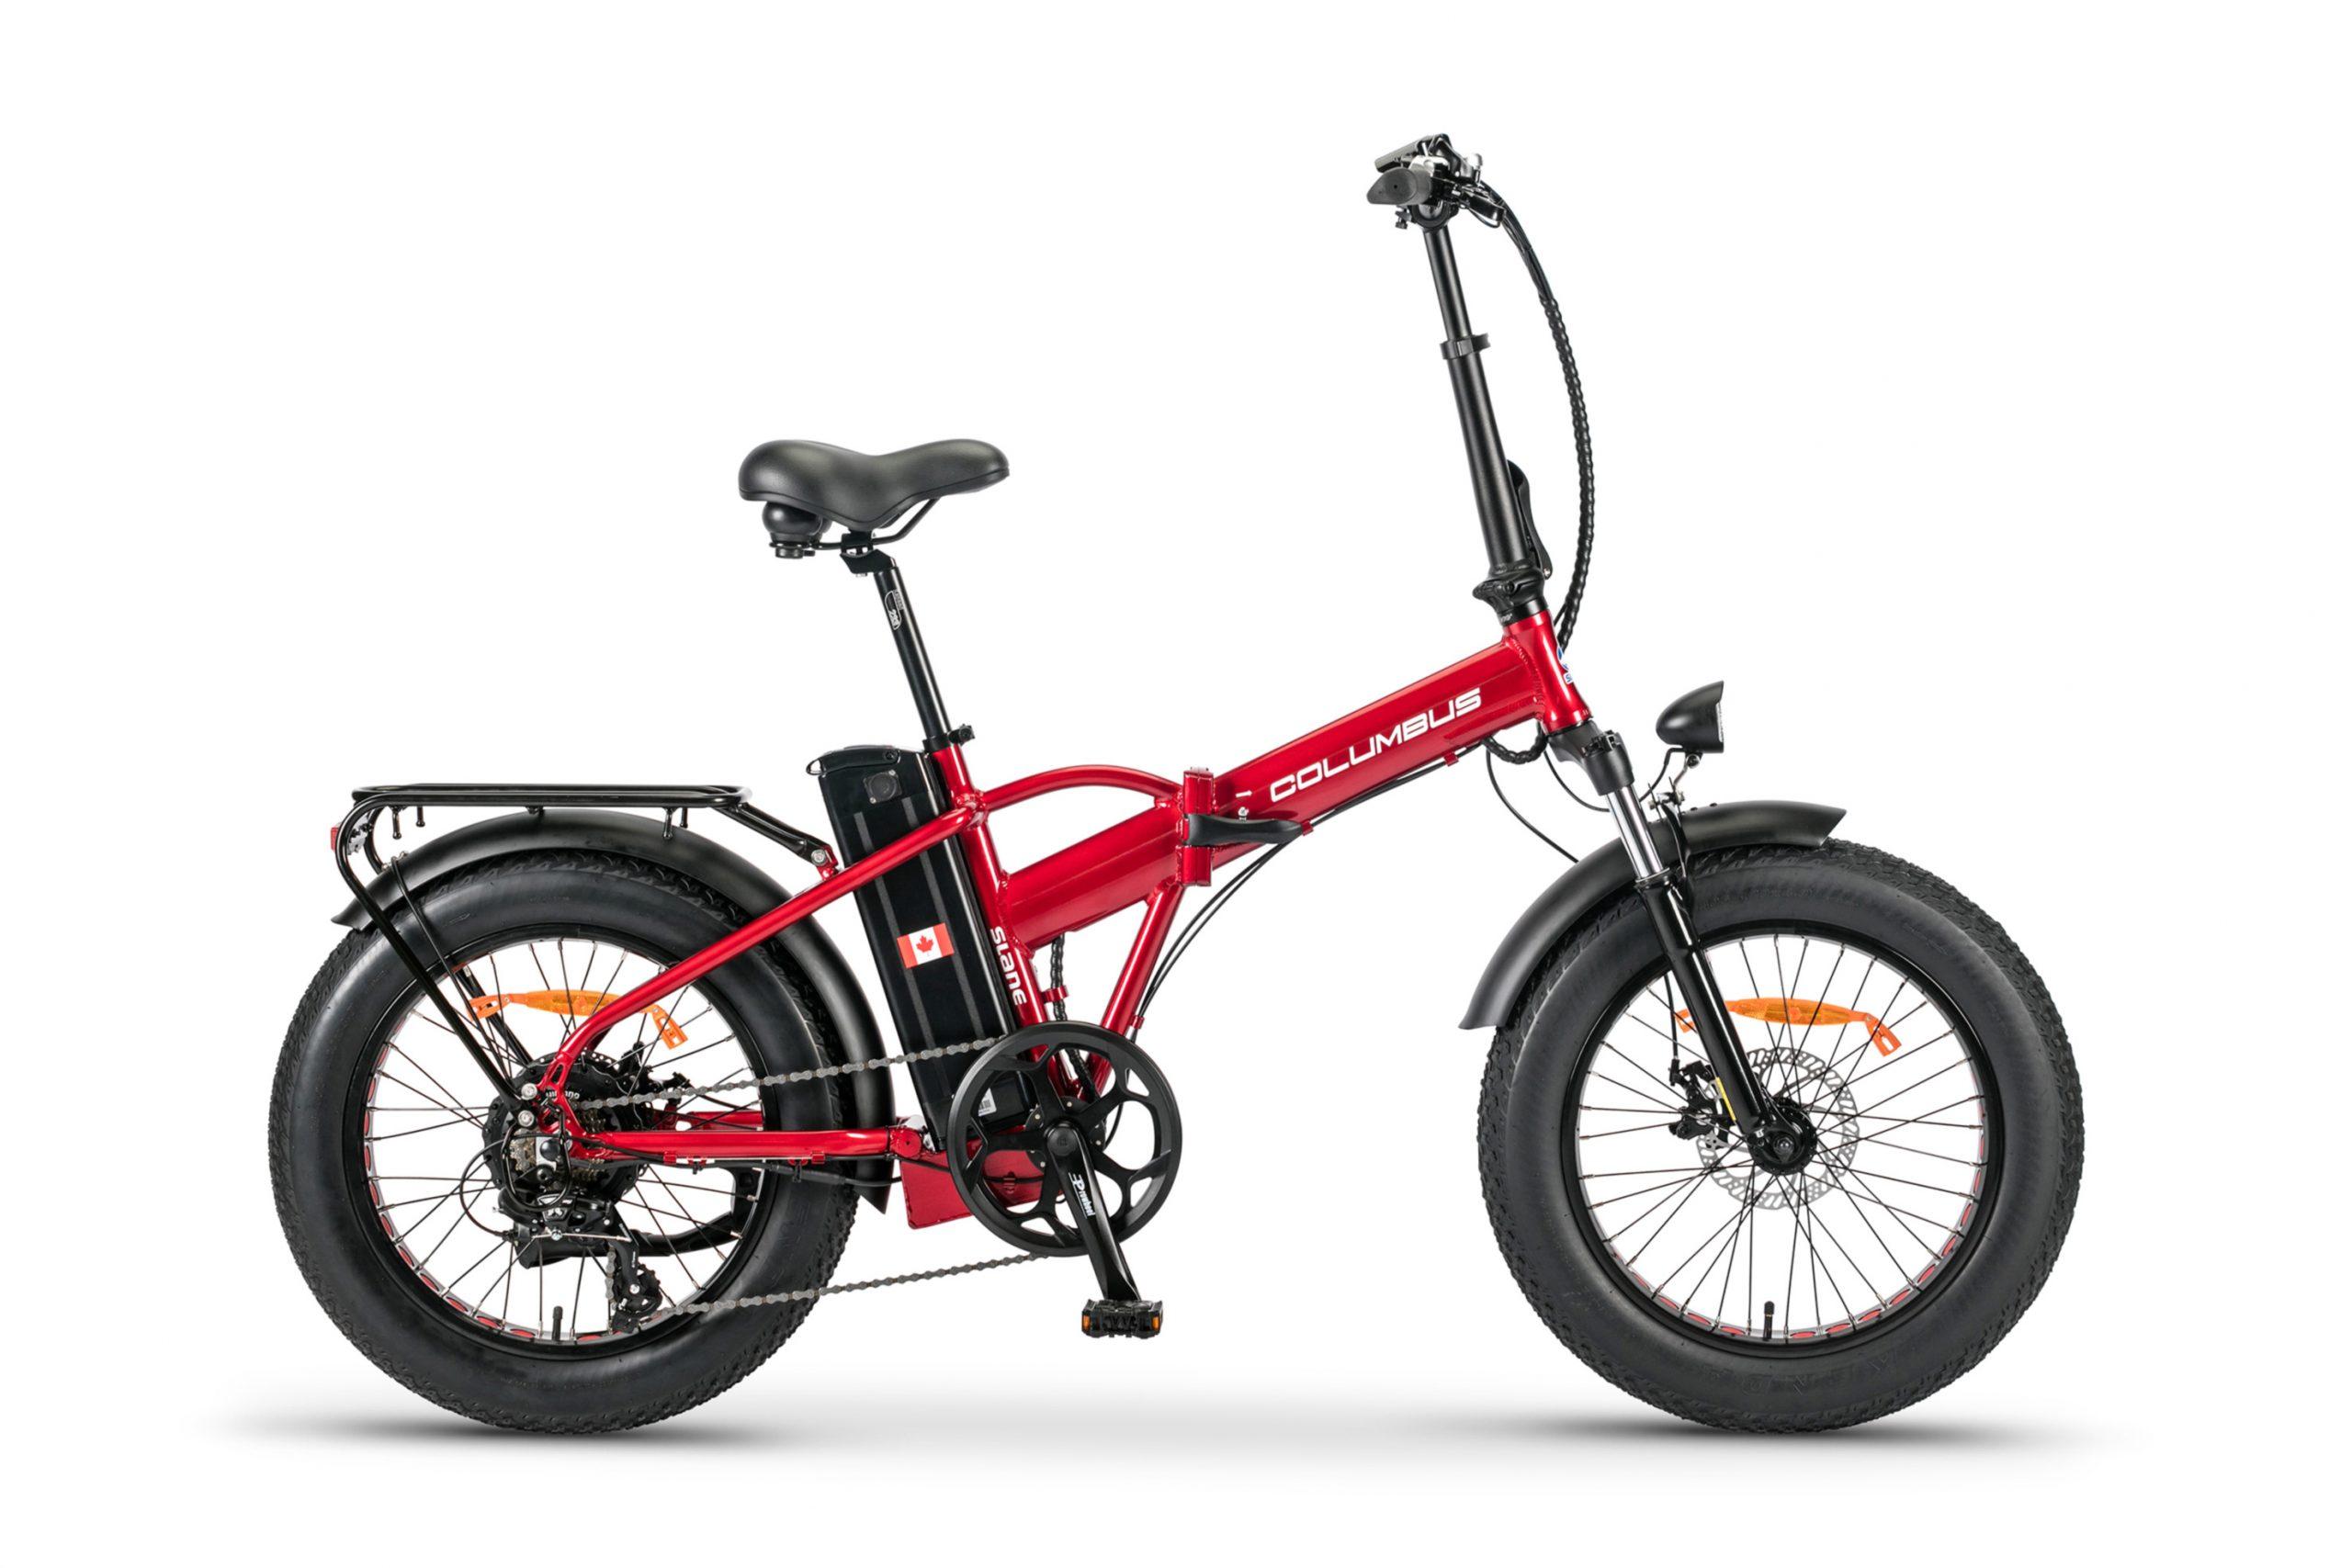 The Slane Columbus E-Bike in a Metallic Red